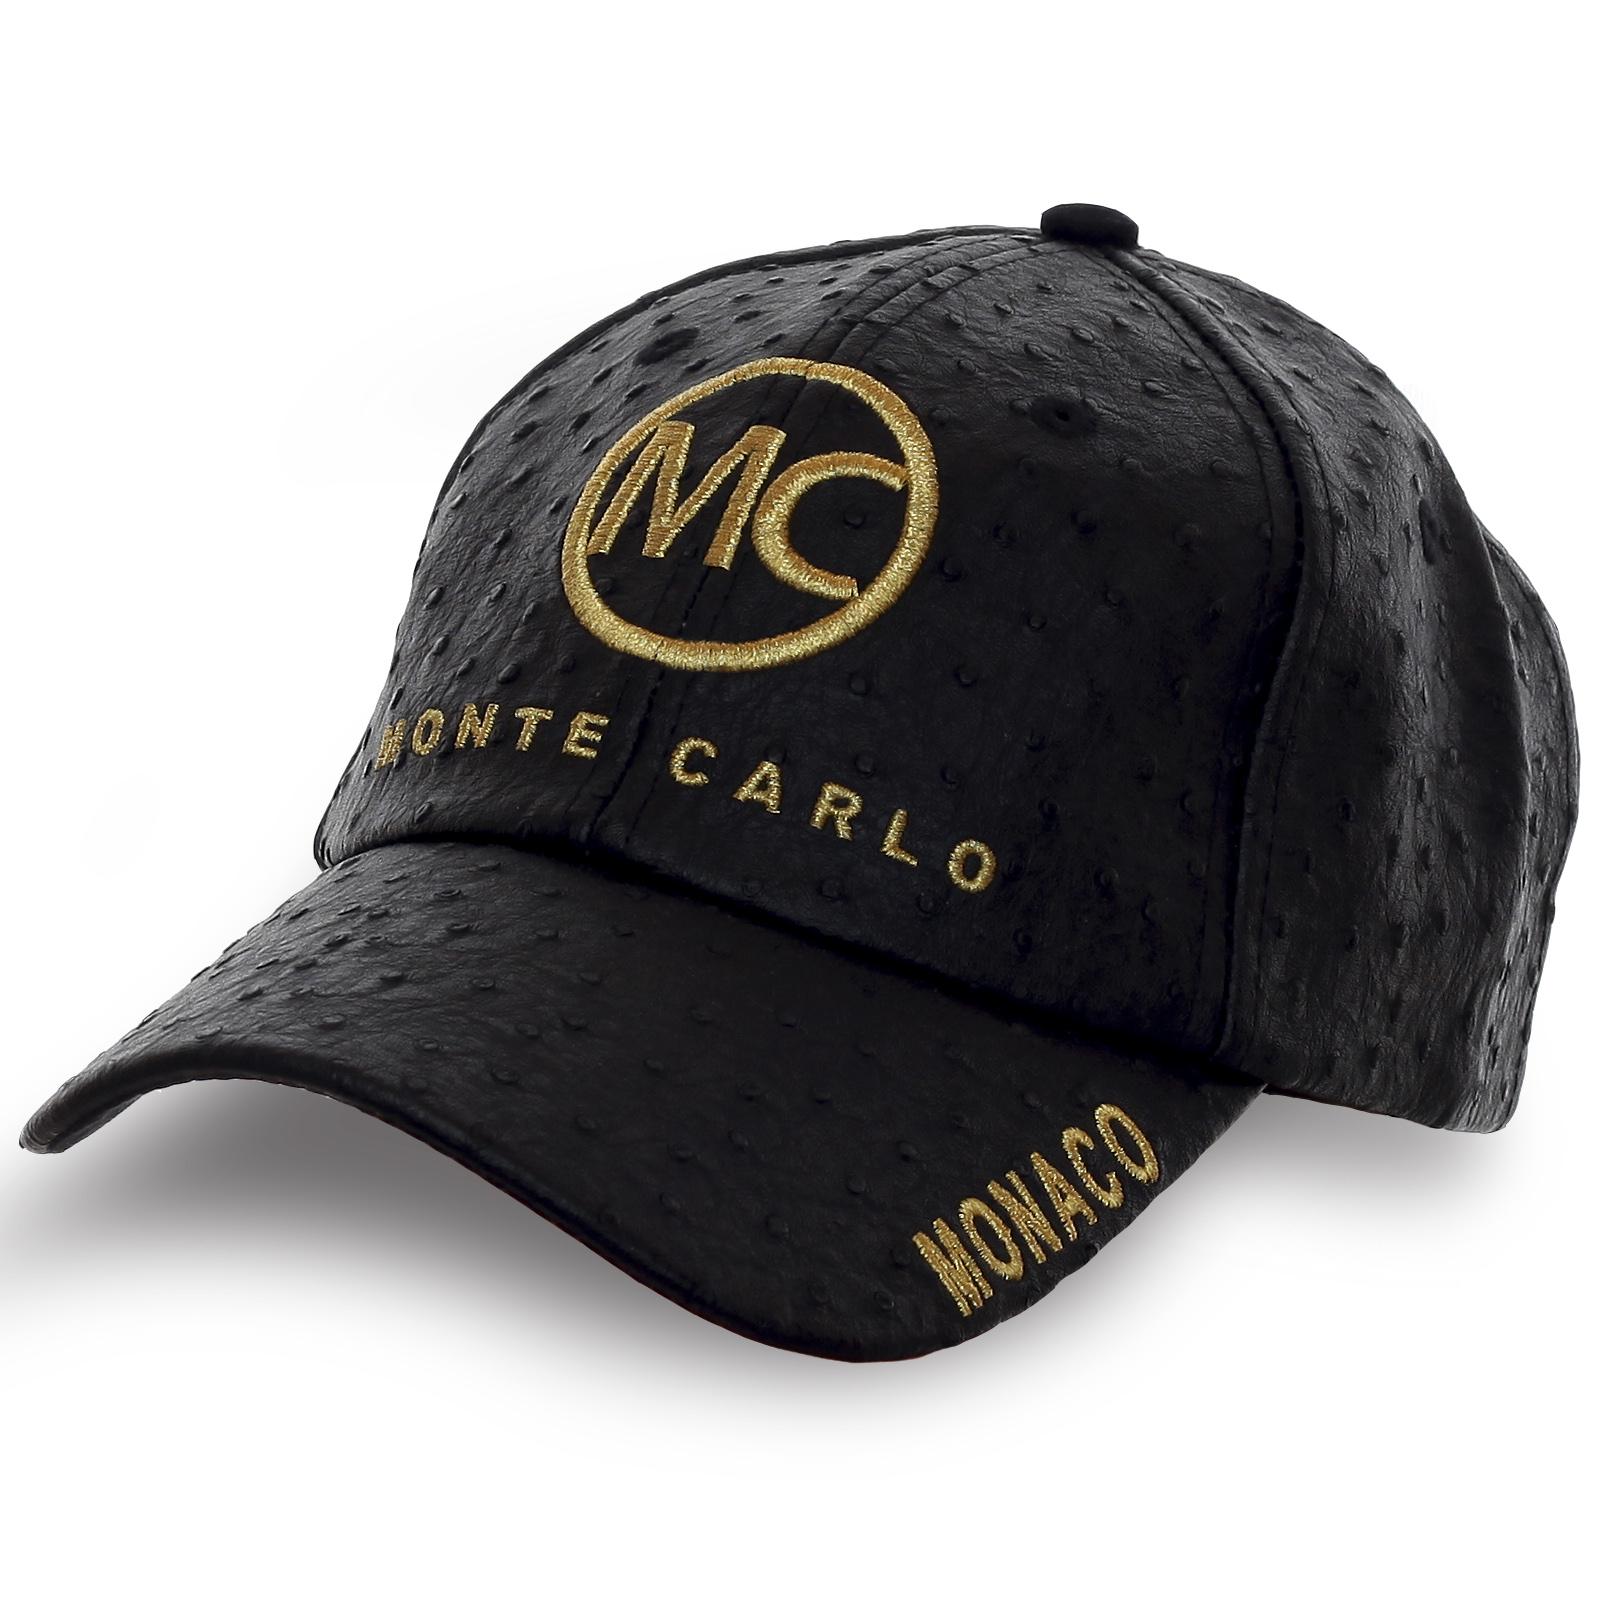 Фирменная бейсболка Monaco Monte-Carlo. Эксклюзив!